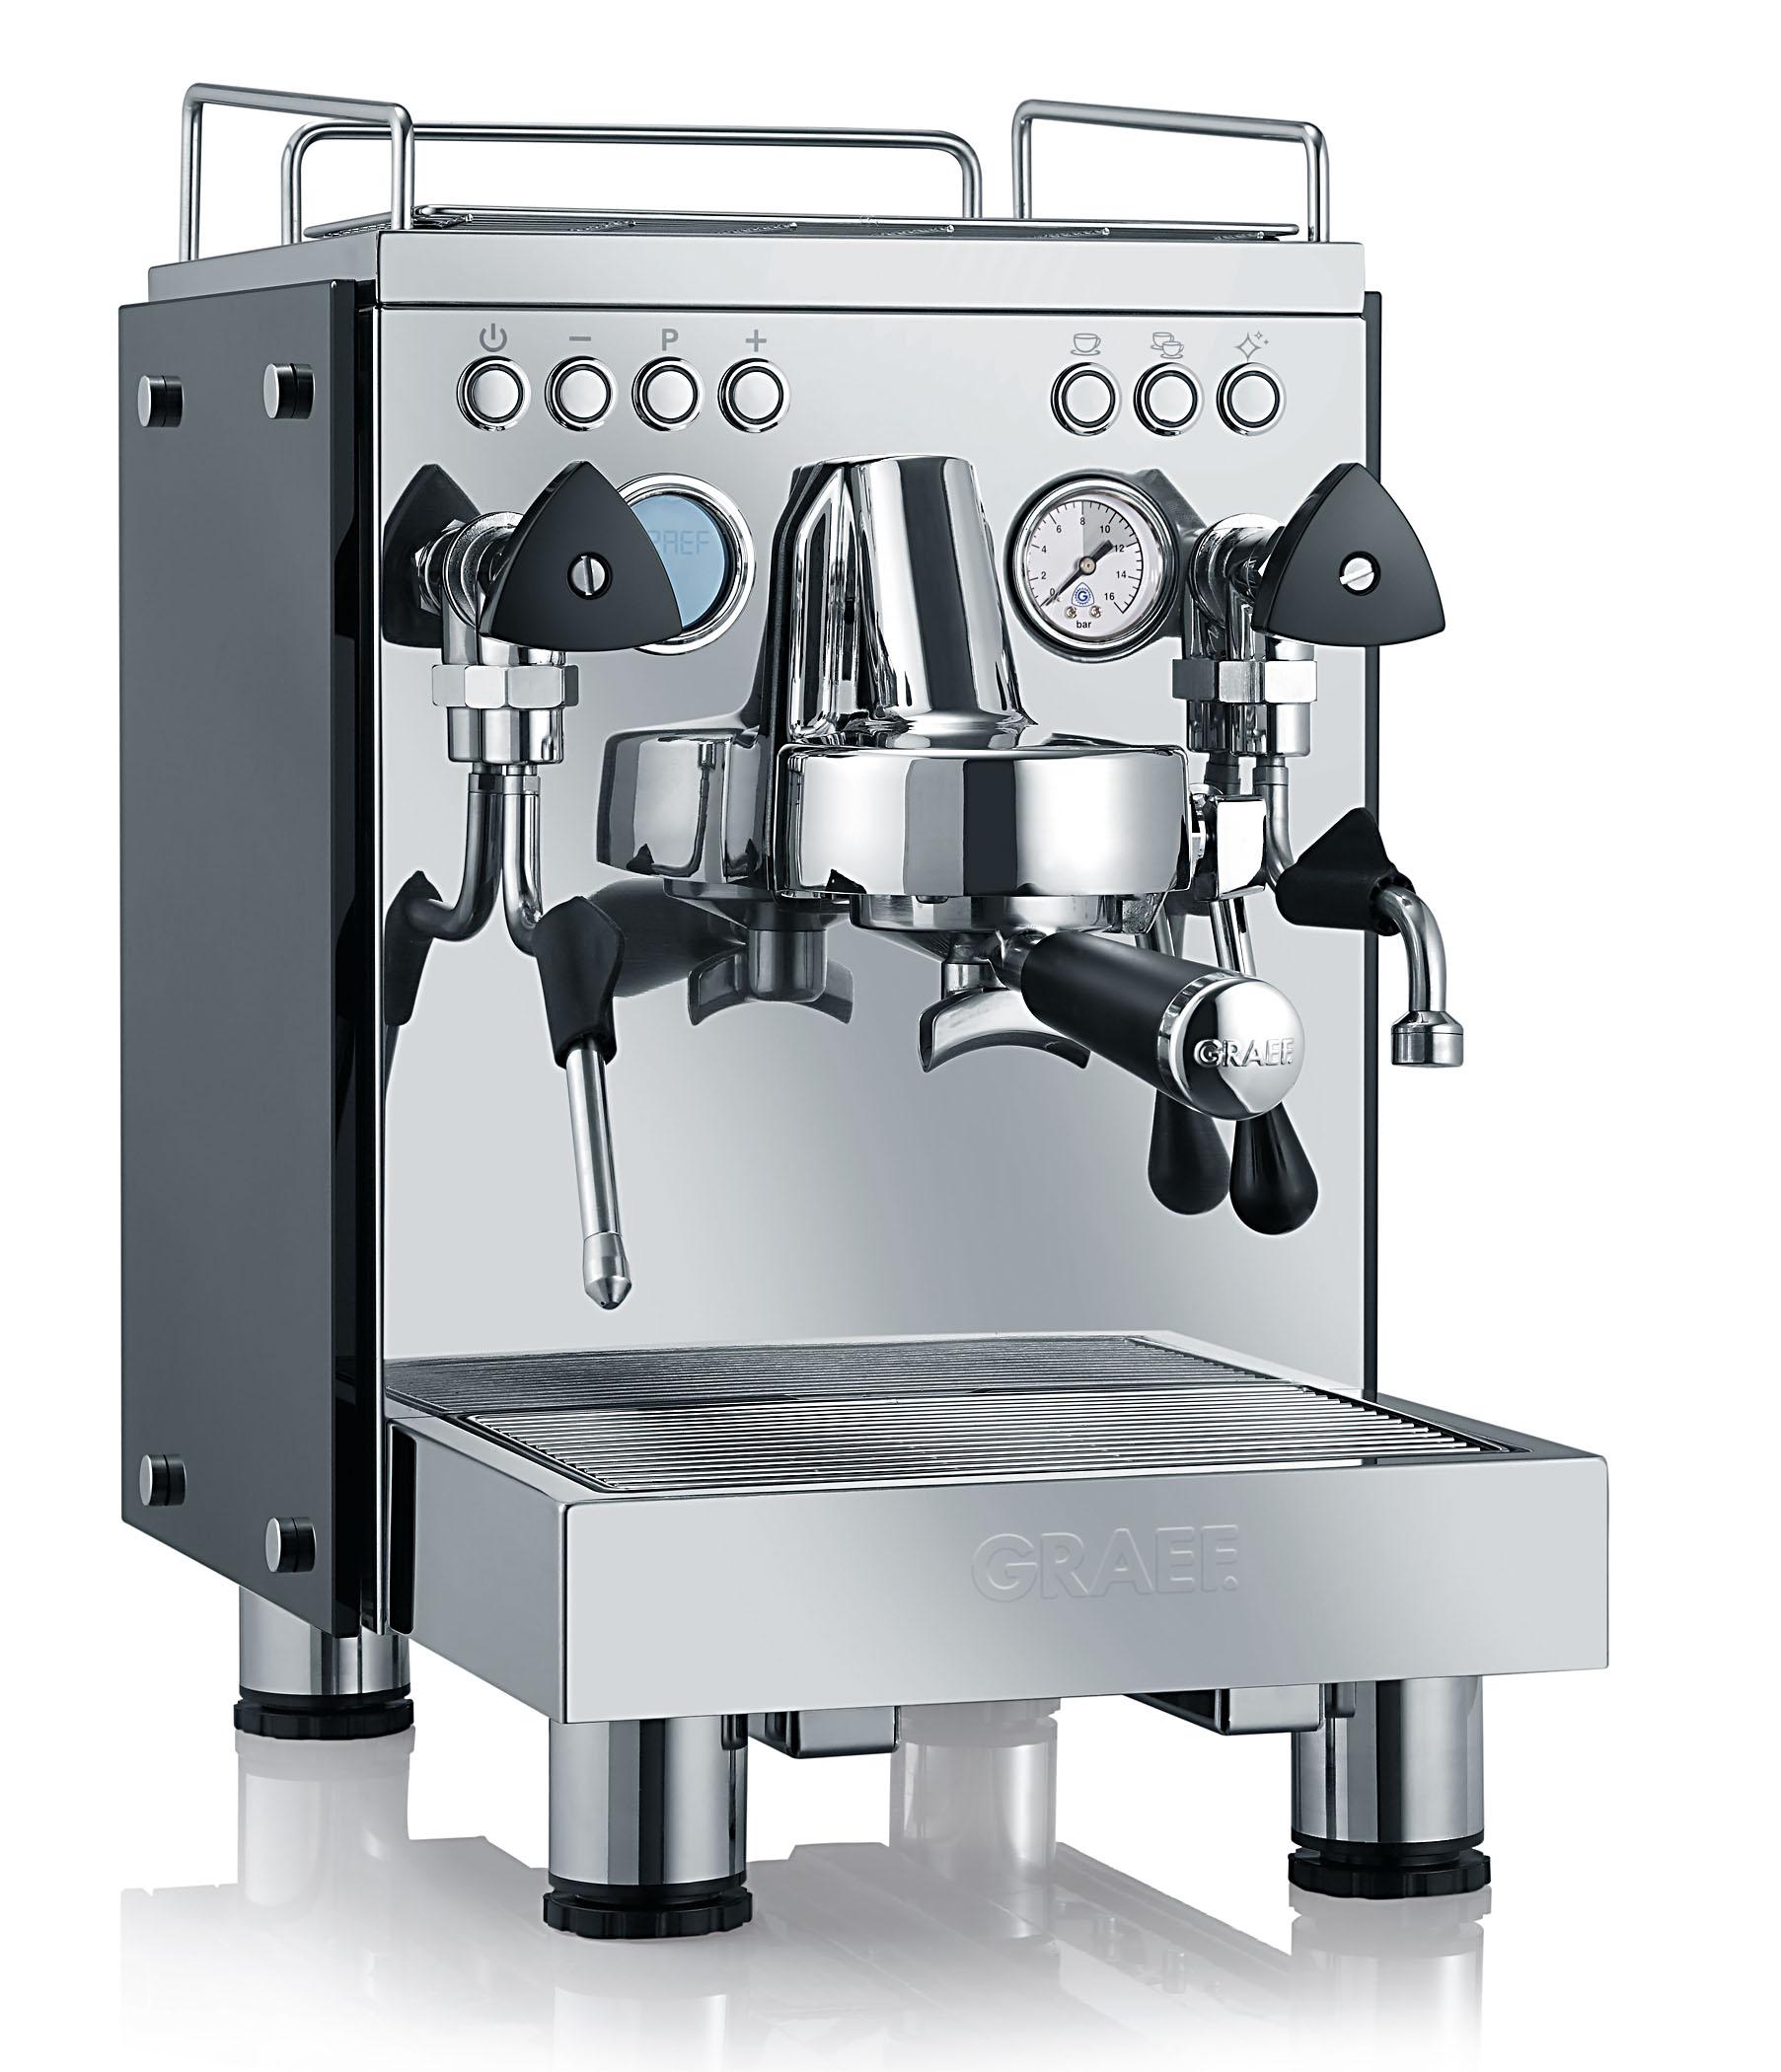 graef espresso kaffeemaschine contessa. Black Bedroom Furniture Sets. Home Design Ideas